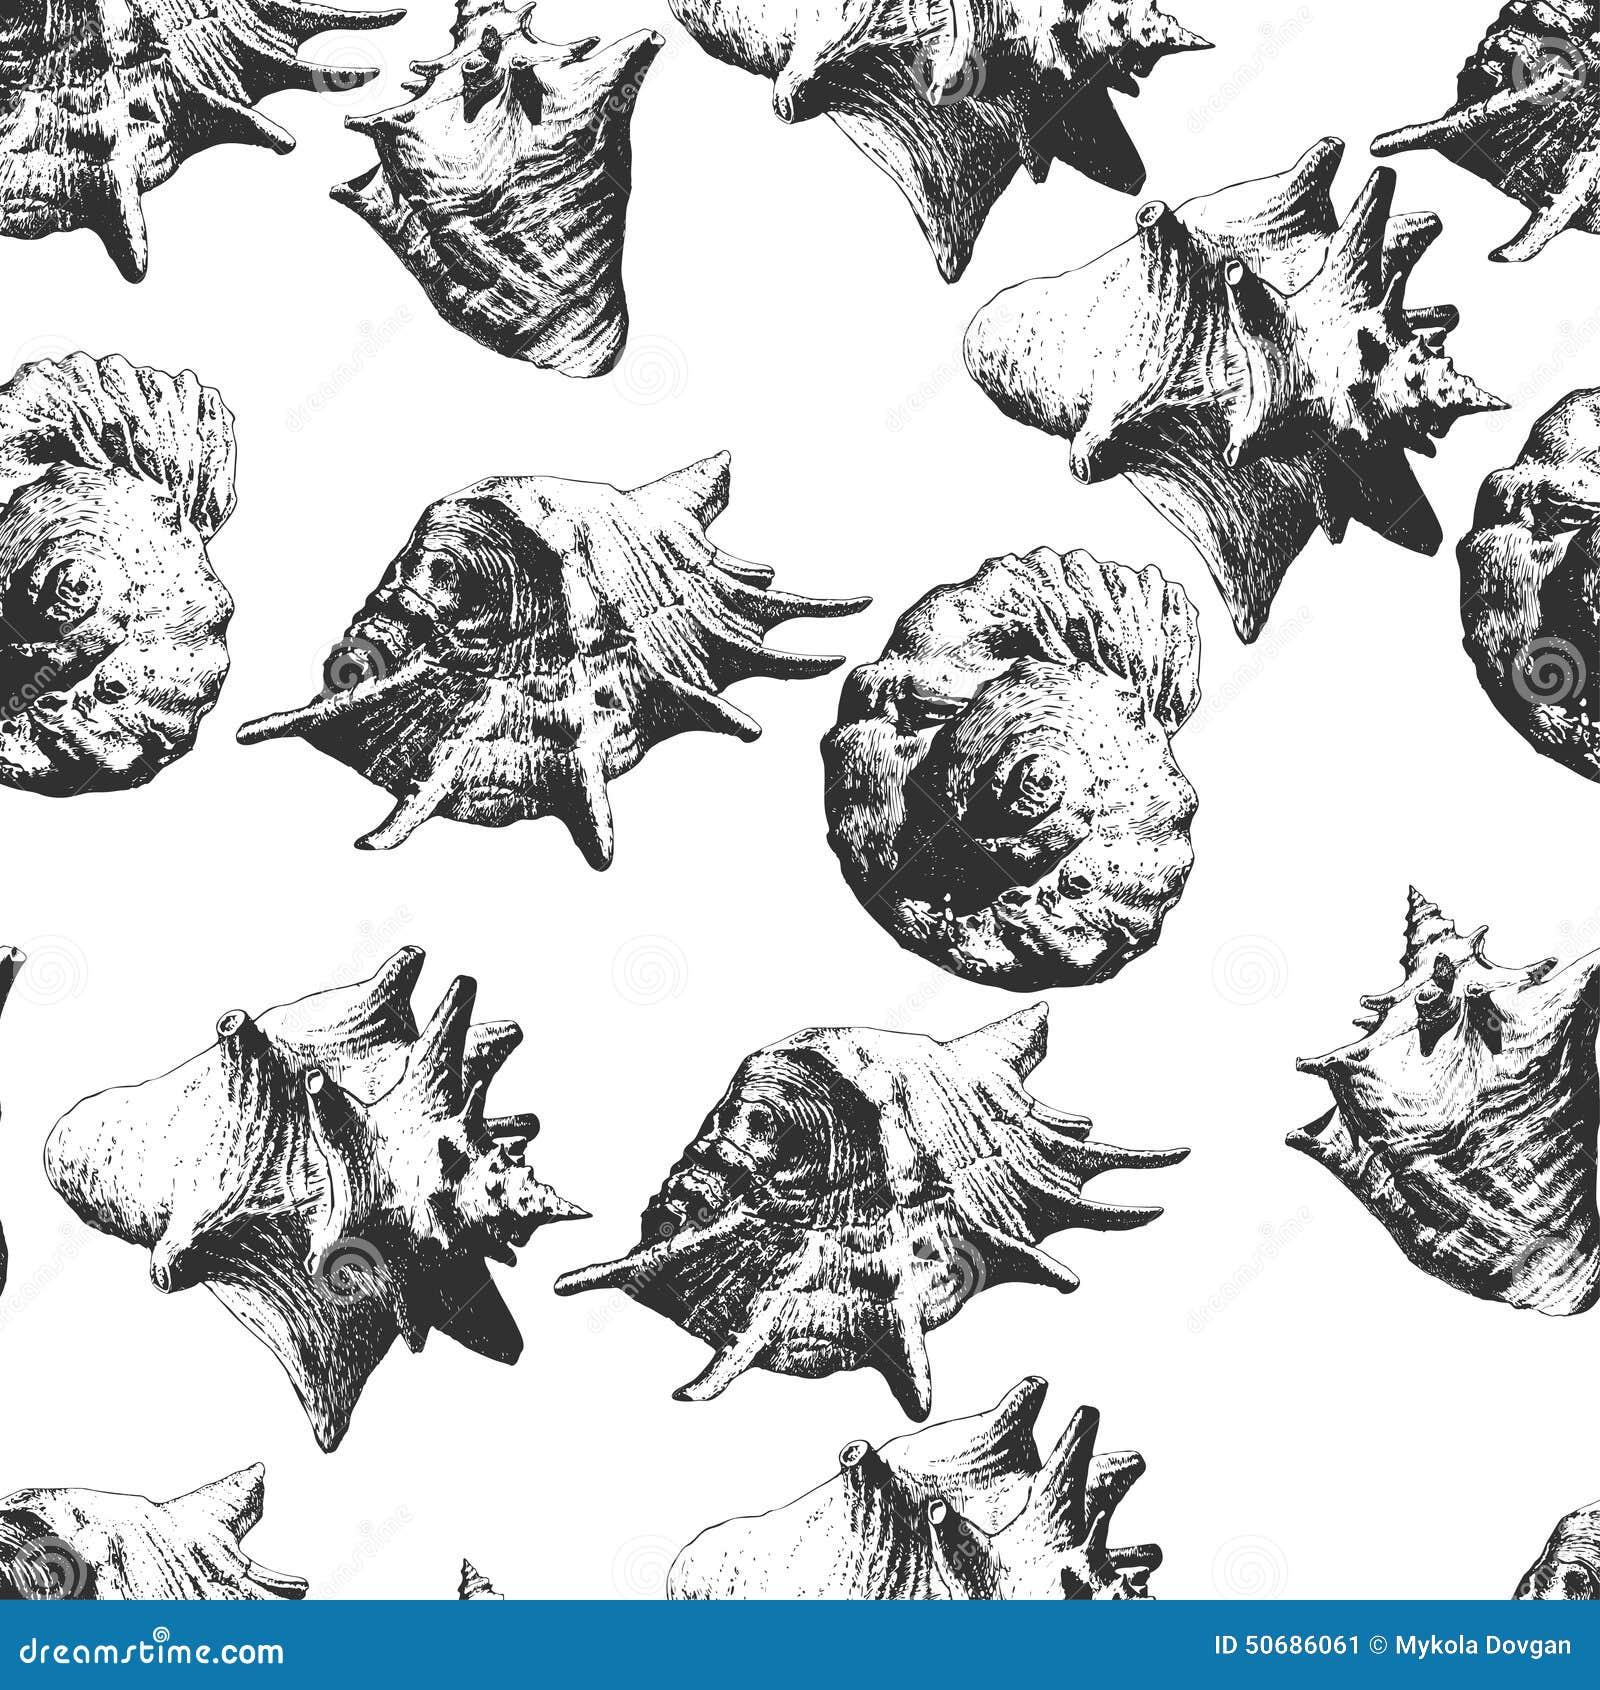 Download 另外模式无缝的壳 库存例证. 插画 包括有 礁石, 要素, 海鲜, 珊瑚, 设计, 扇贝, 海扇壳, 华丽 - 50686061